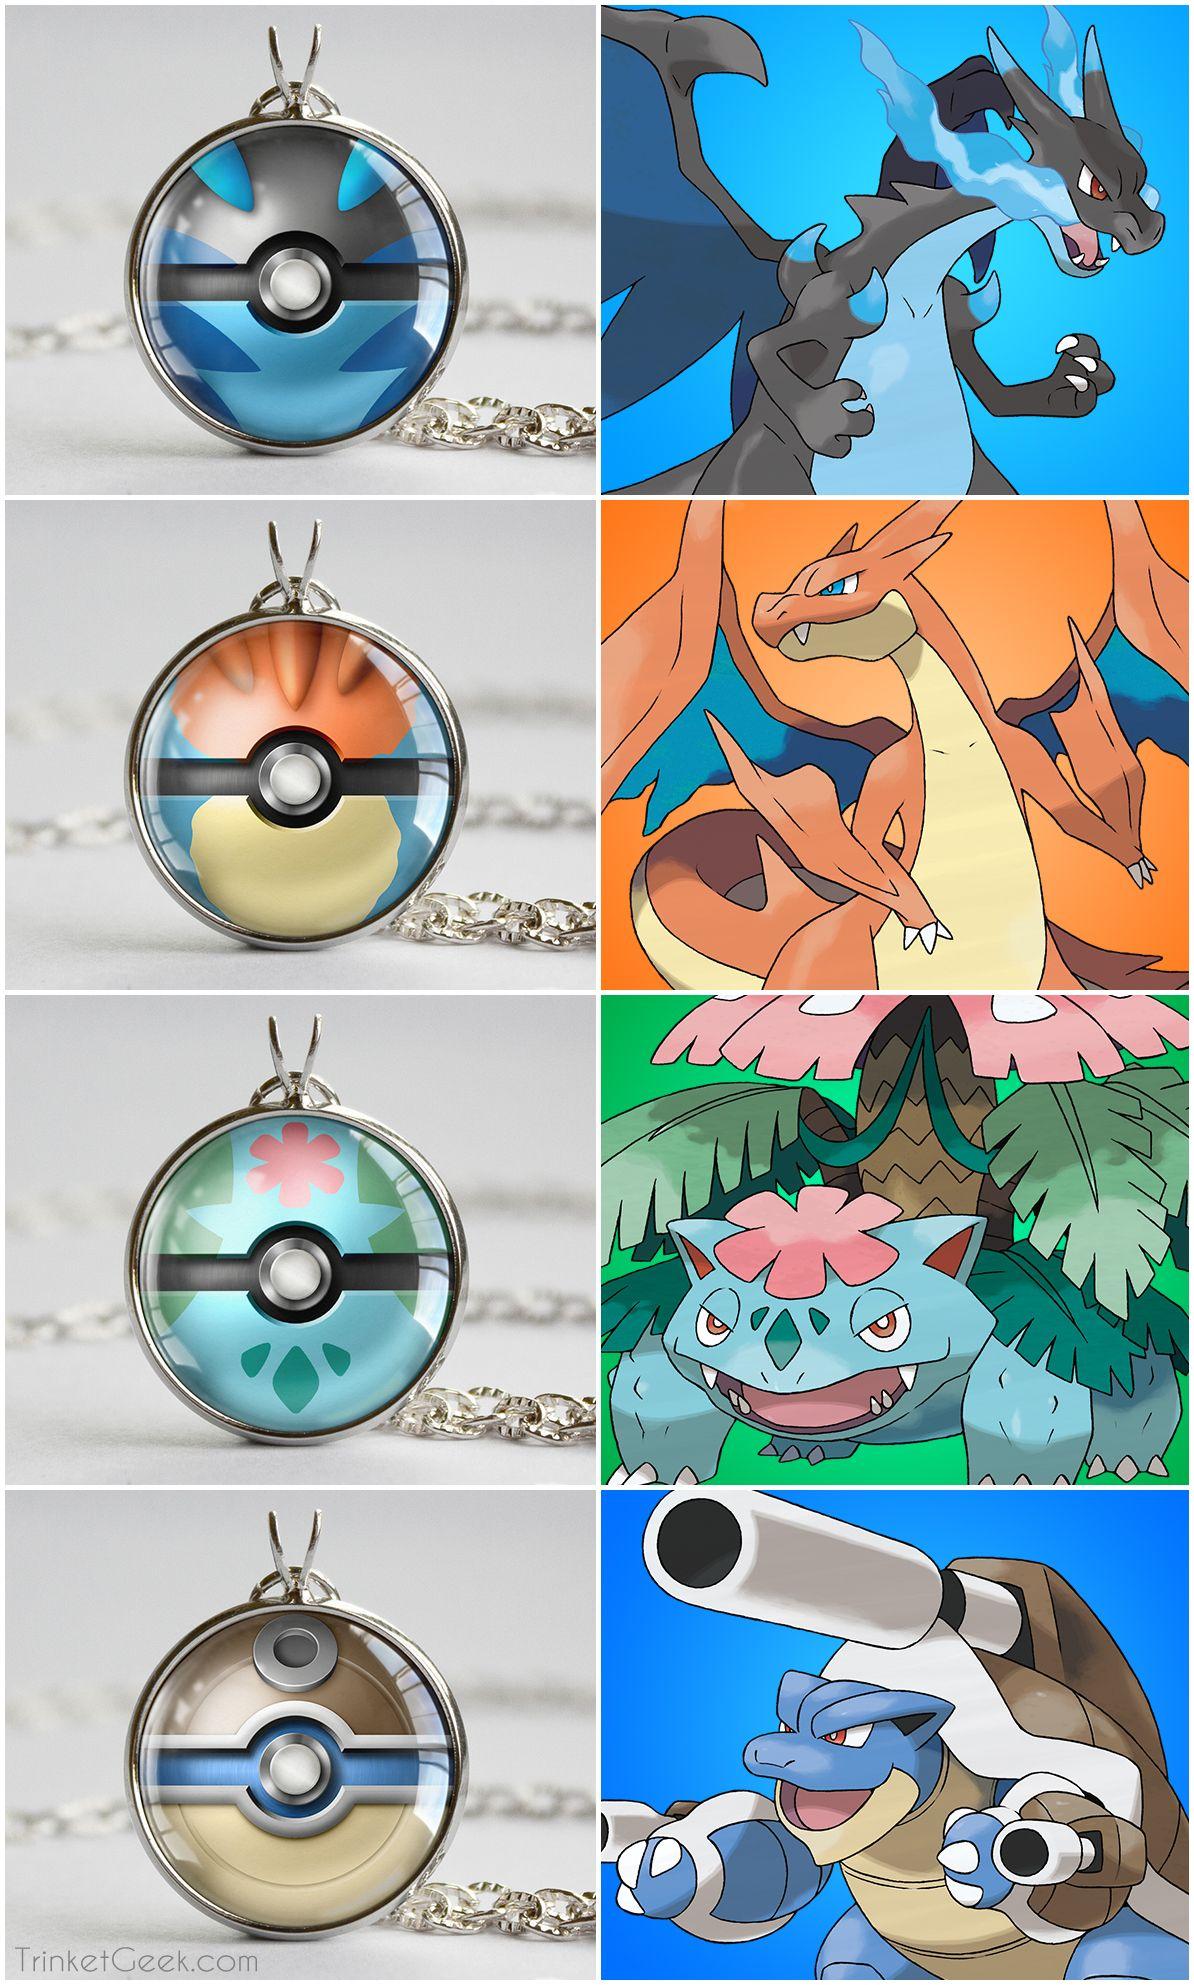 Pkmn Kanto Starter Themed Pokeball Pendants Pokemon Pokémon